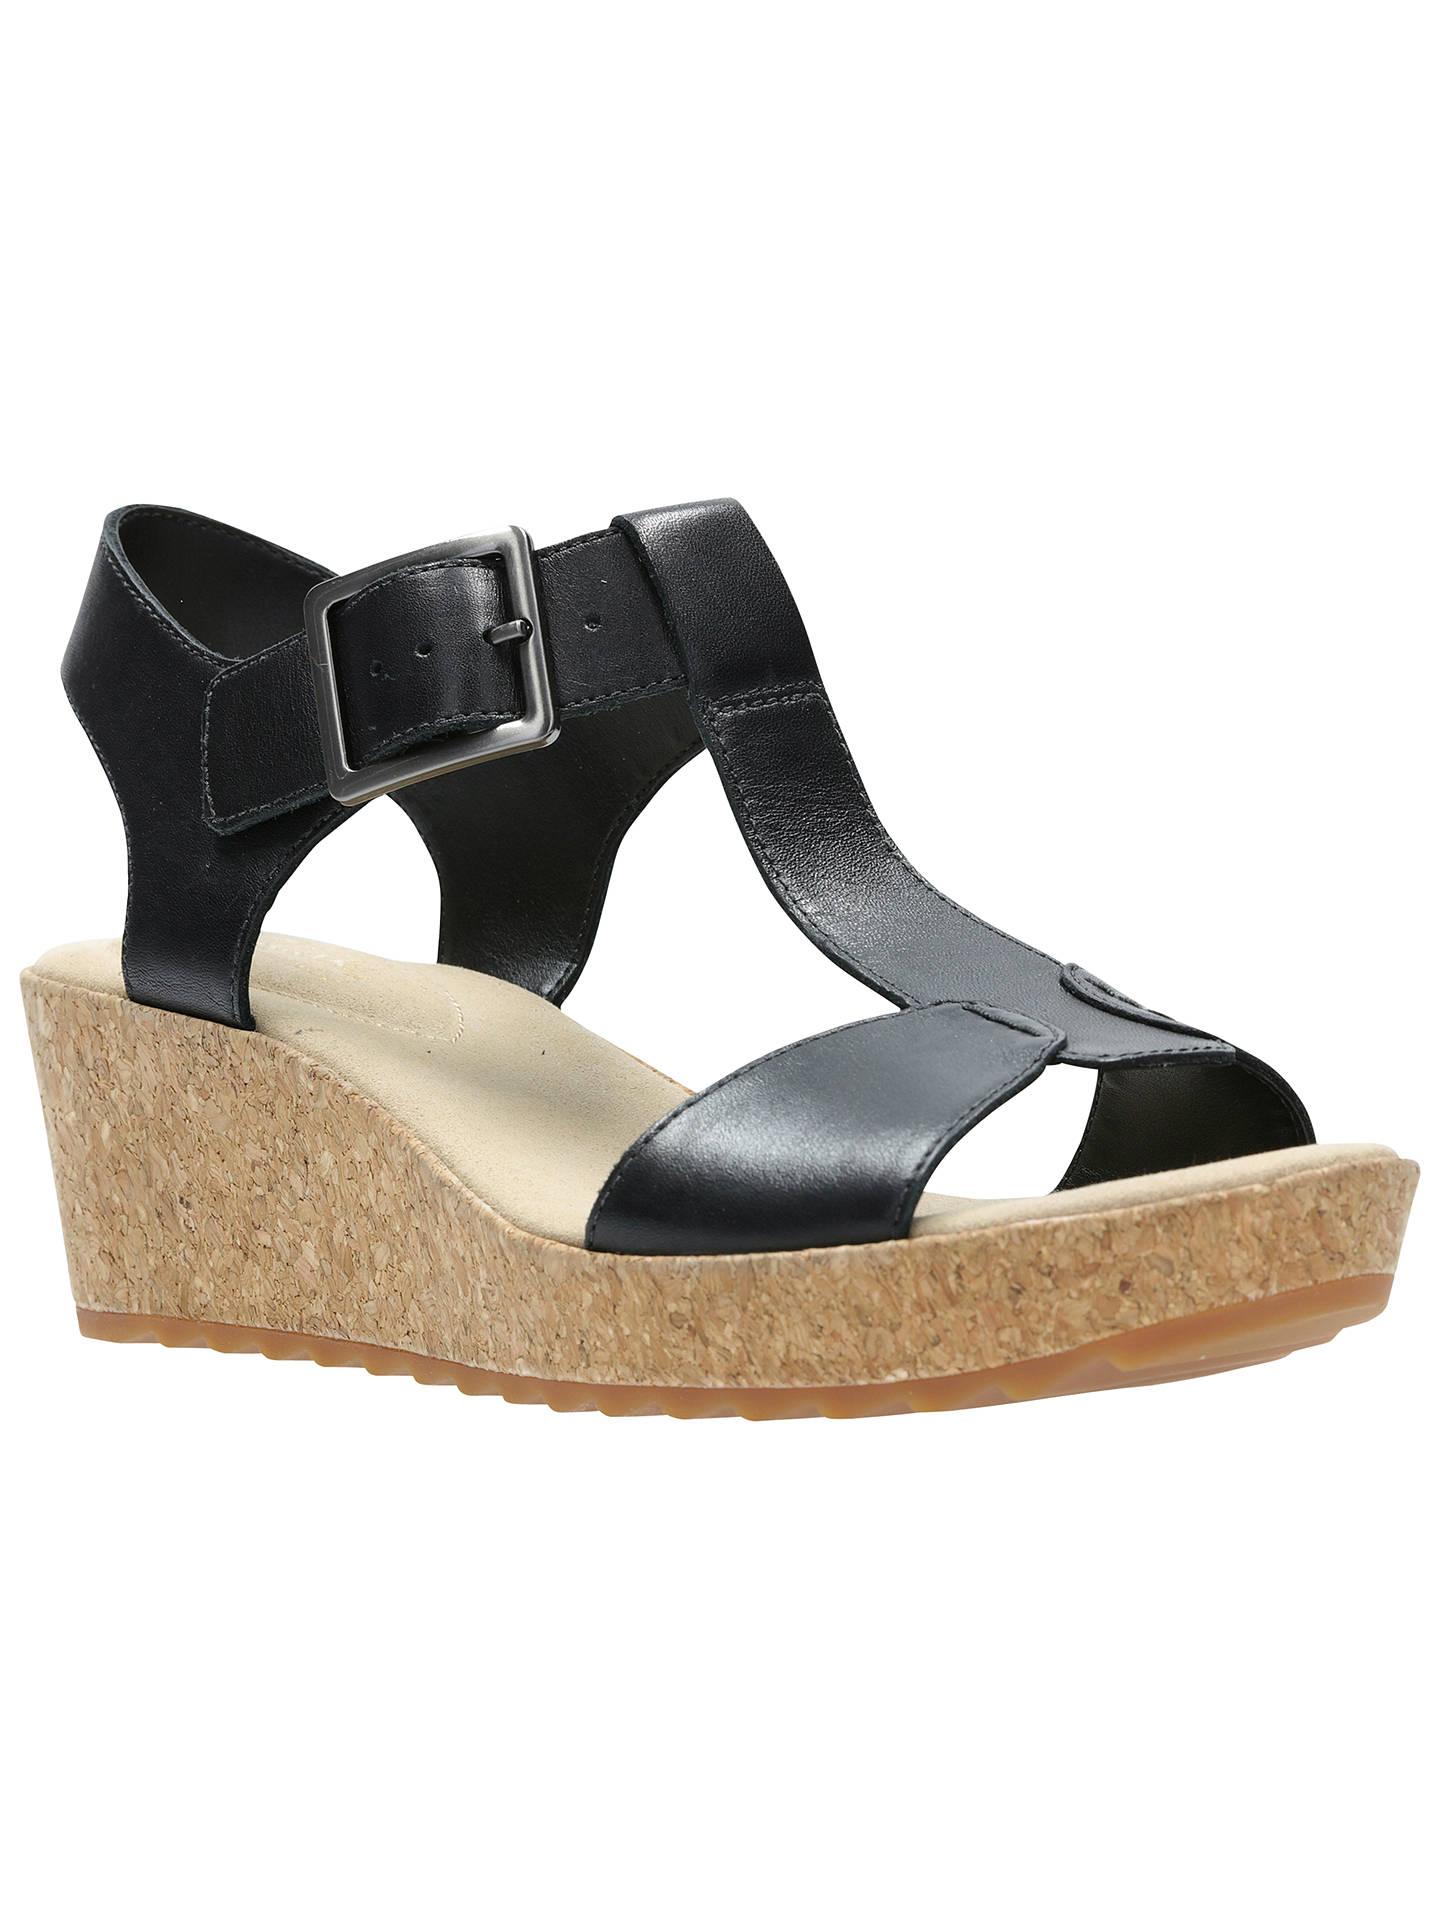 837cfd49af9c Buy Clarks Kamara Kiki Wedge Heeled Sandals